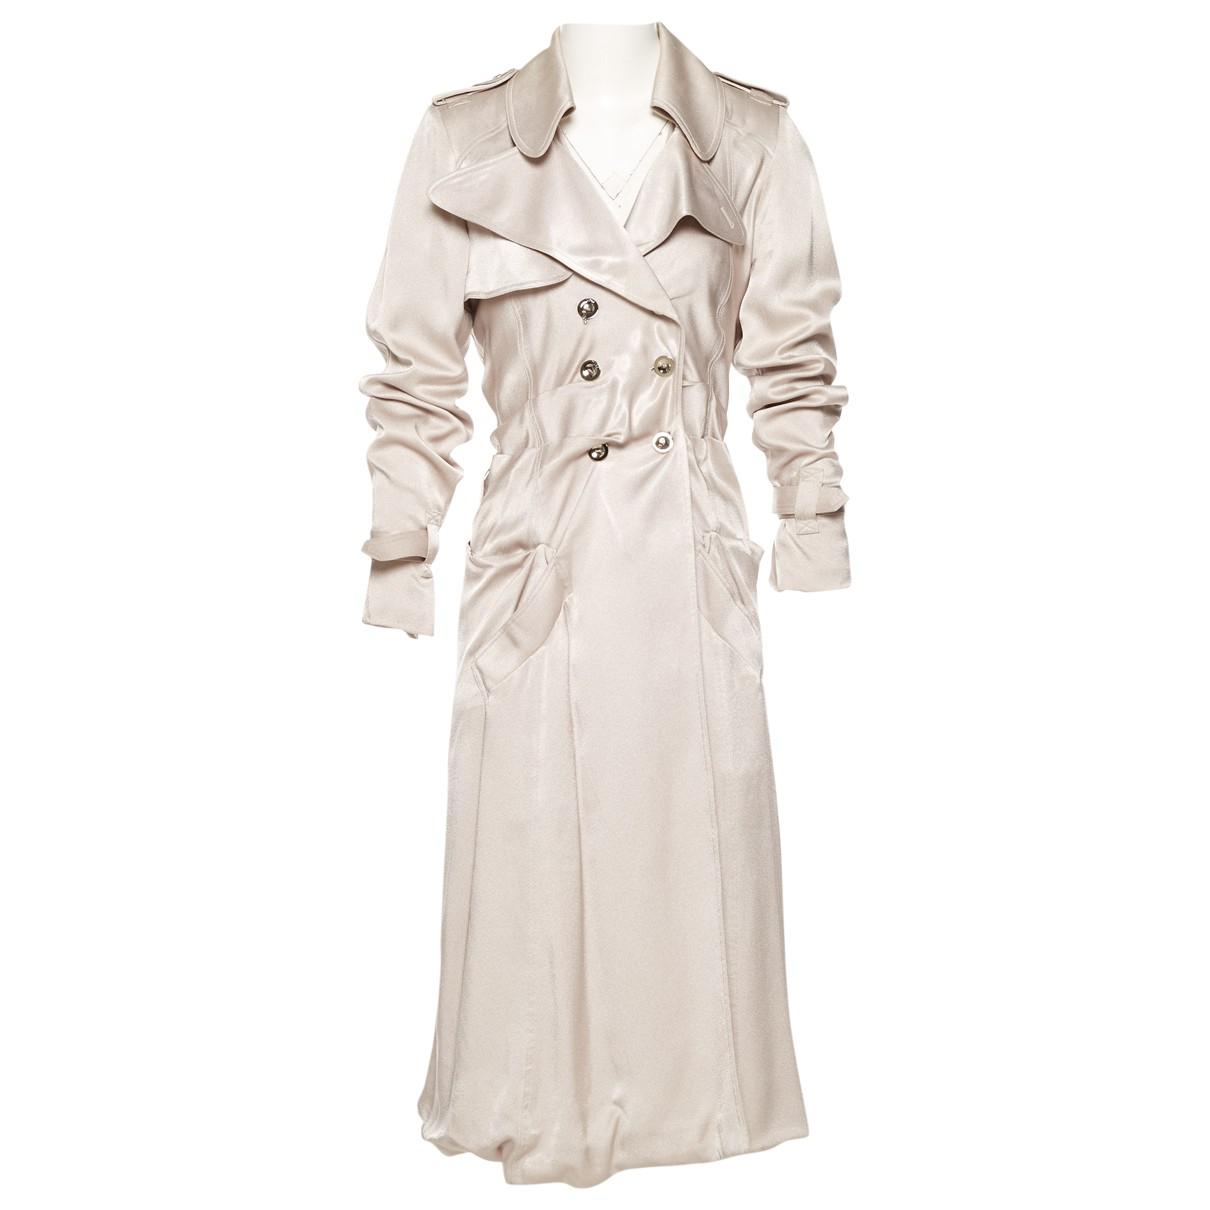 4eed01b9384fe Dior Vintage Metallic Silk Trench Coat in Metallic - Lyst